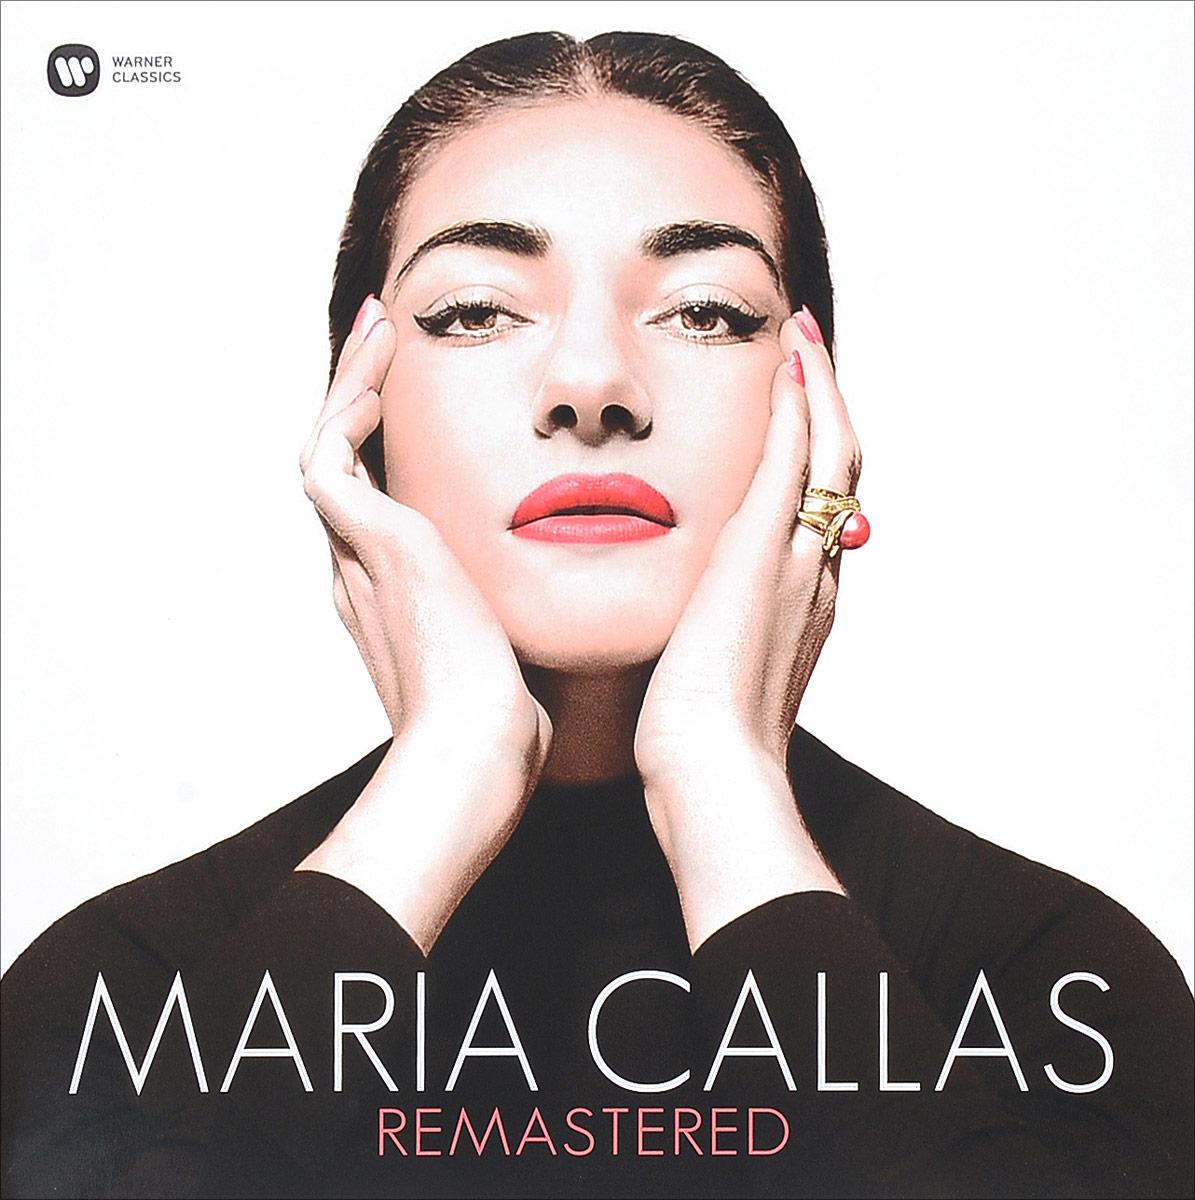 Фото - Мария Каллас Maria Callas. Remastered (LP) maria callas maria callas remastered